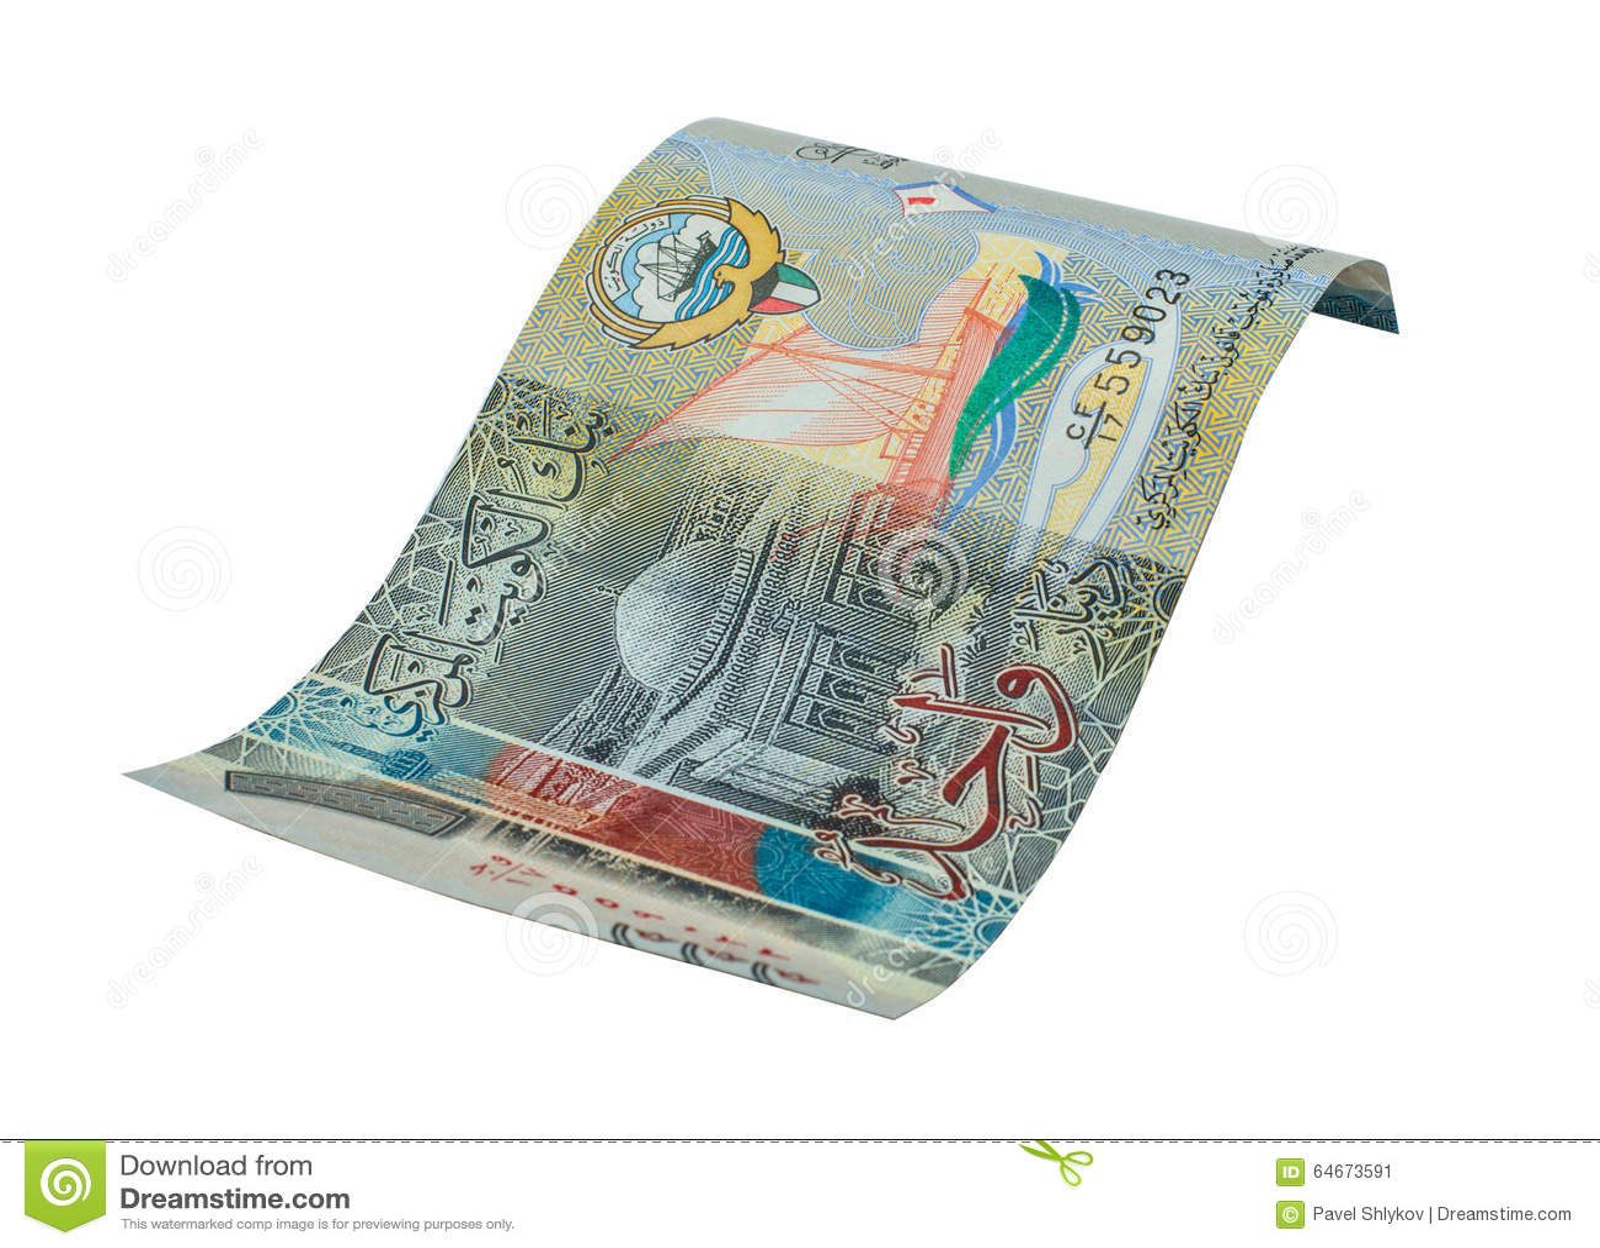 Kuwait forex trading